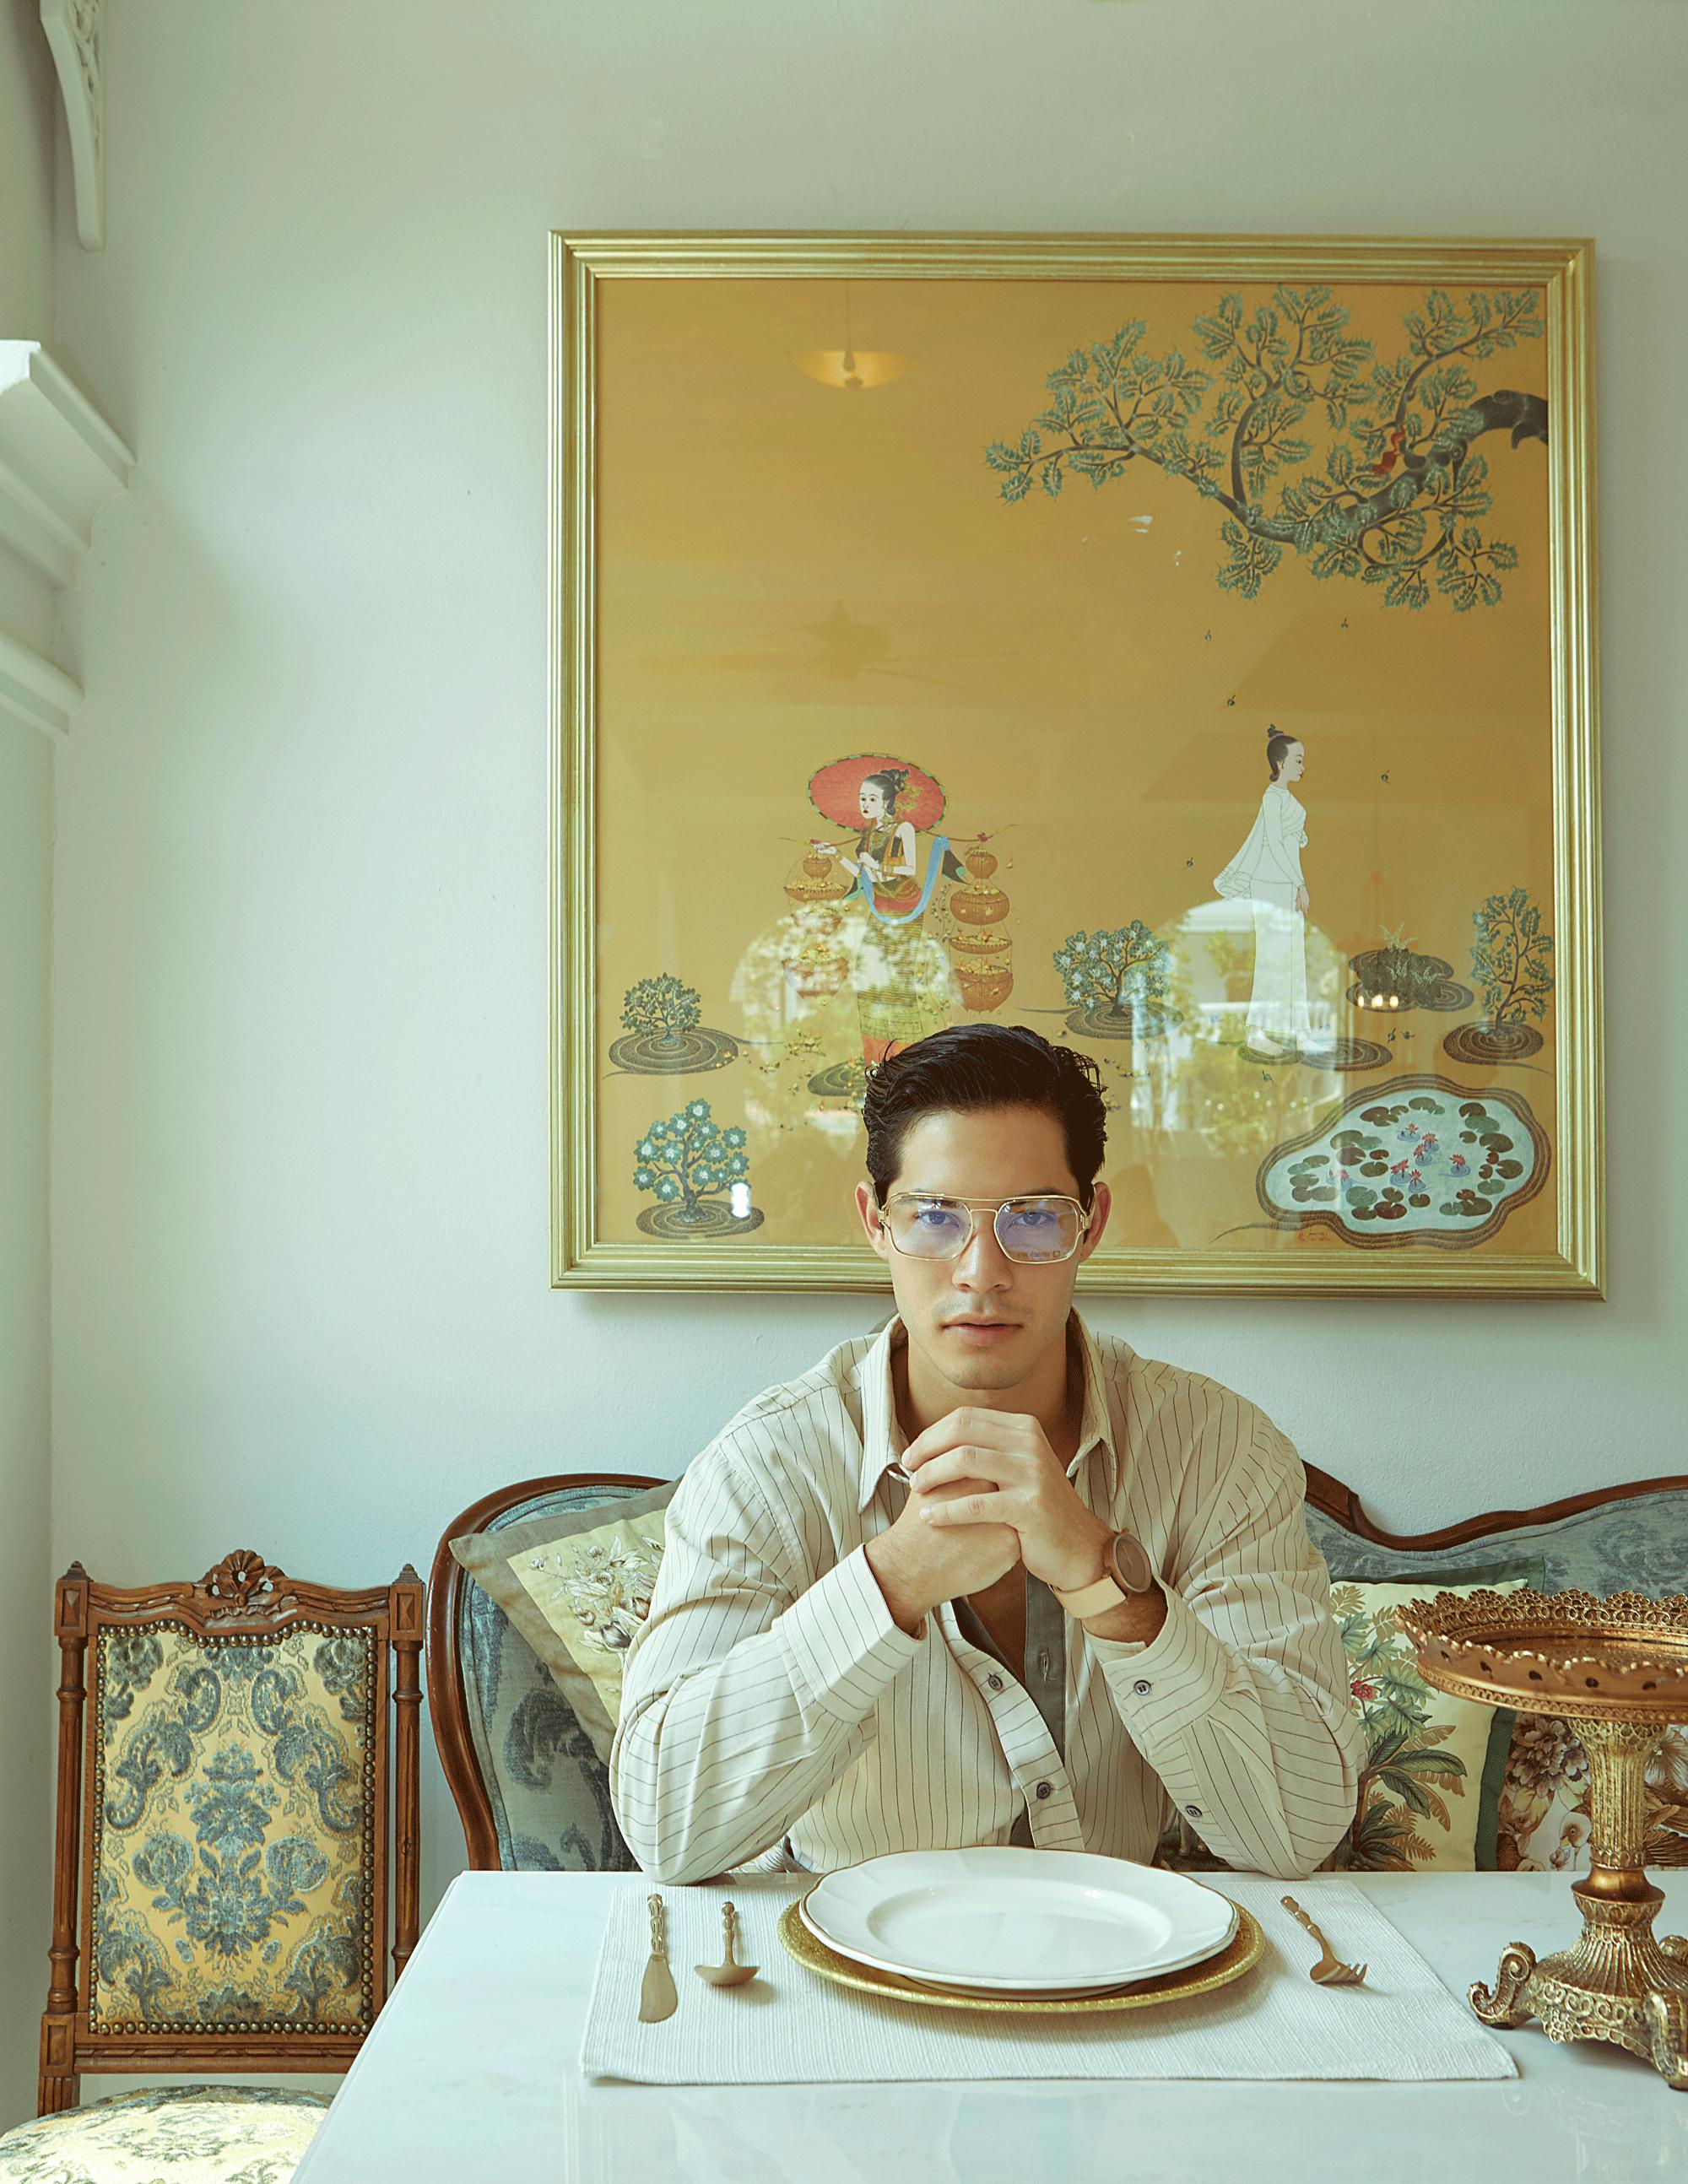 clothes : Leisure Projects / eyeglasses : Blake Kuwahara